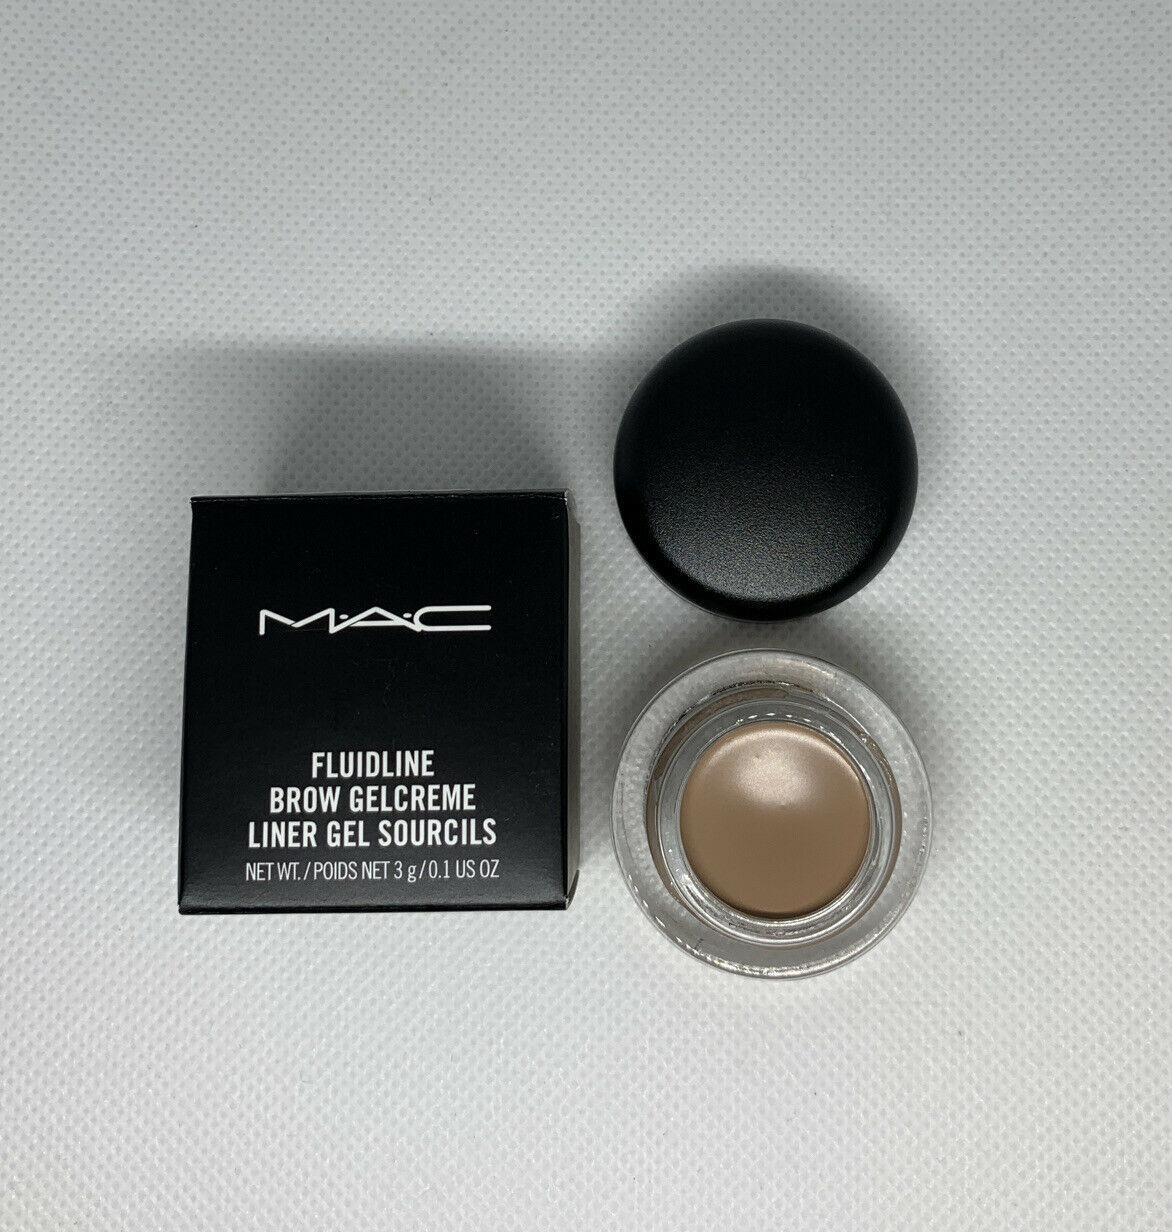 MAC Fluidline Brow Gelcreme Liner Gel -ASH BLONDE- Full Size 3g .1 oz New In Box - $16.24